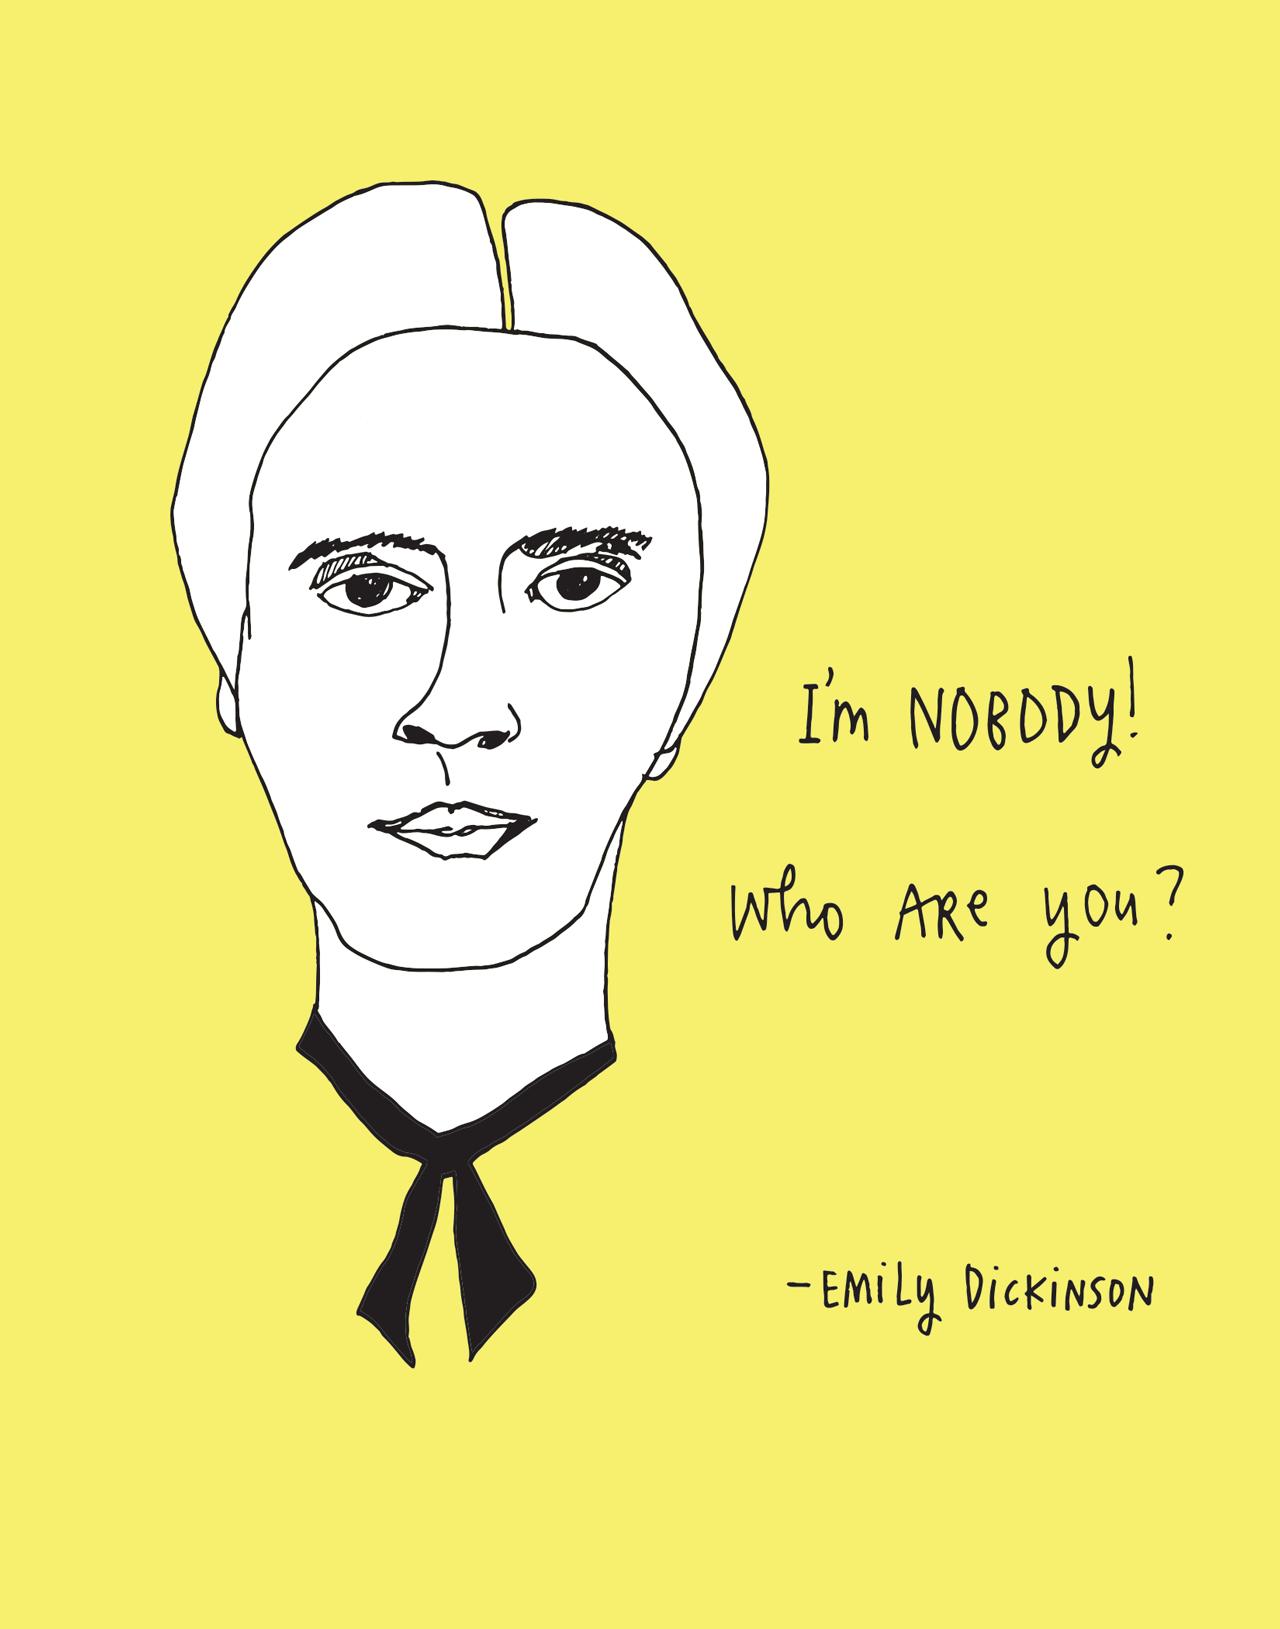 EMILY-DICKINSON-I'M-NOBODY